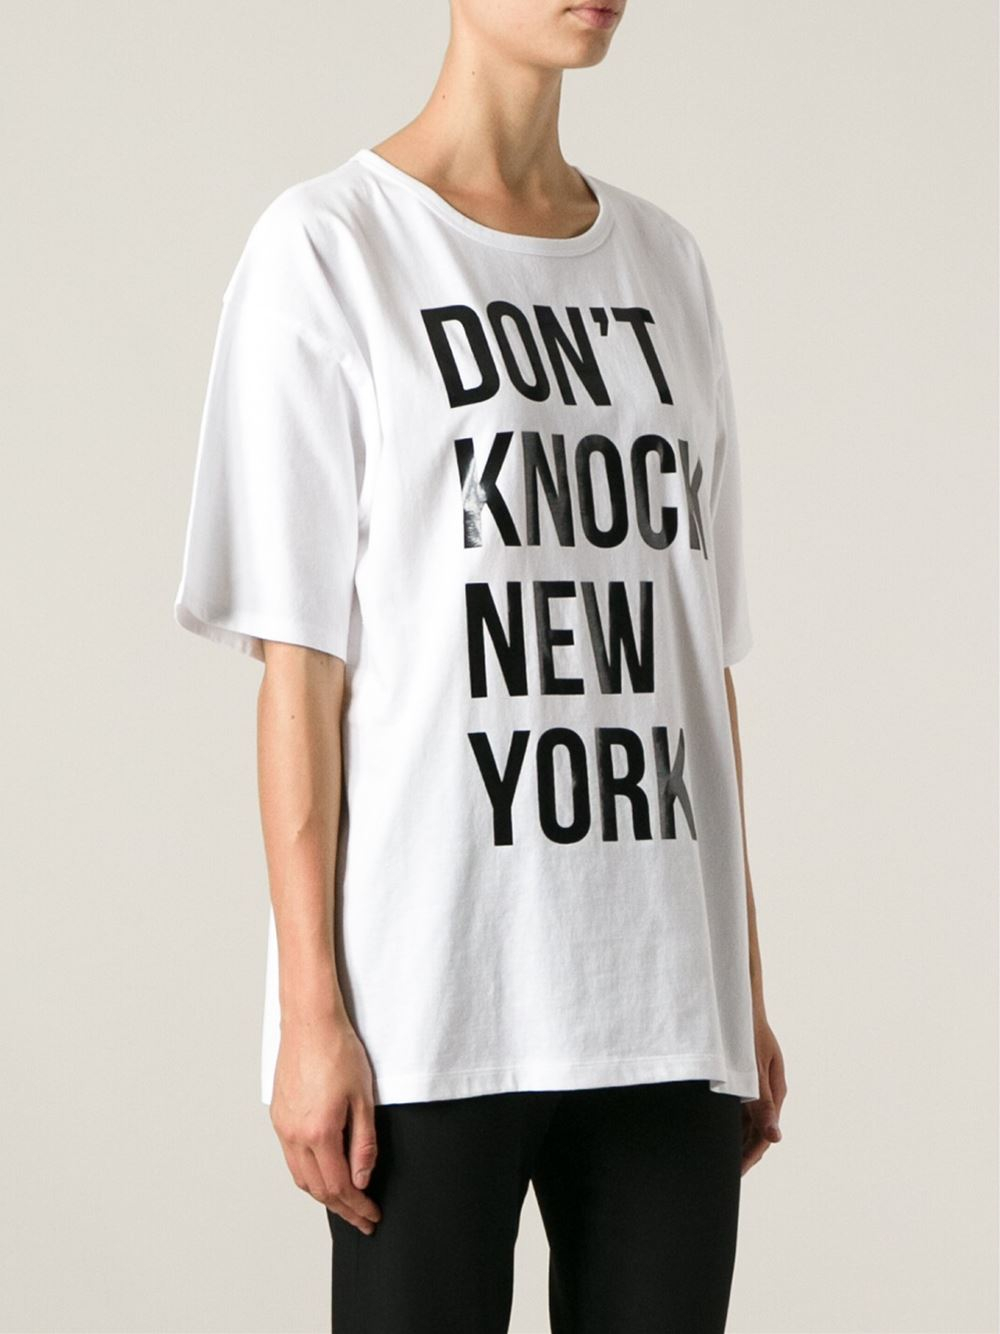 Lyst - DKNY  Don T Knock New York  Oversized T-Shirt in White e3731555419